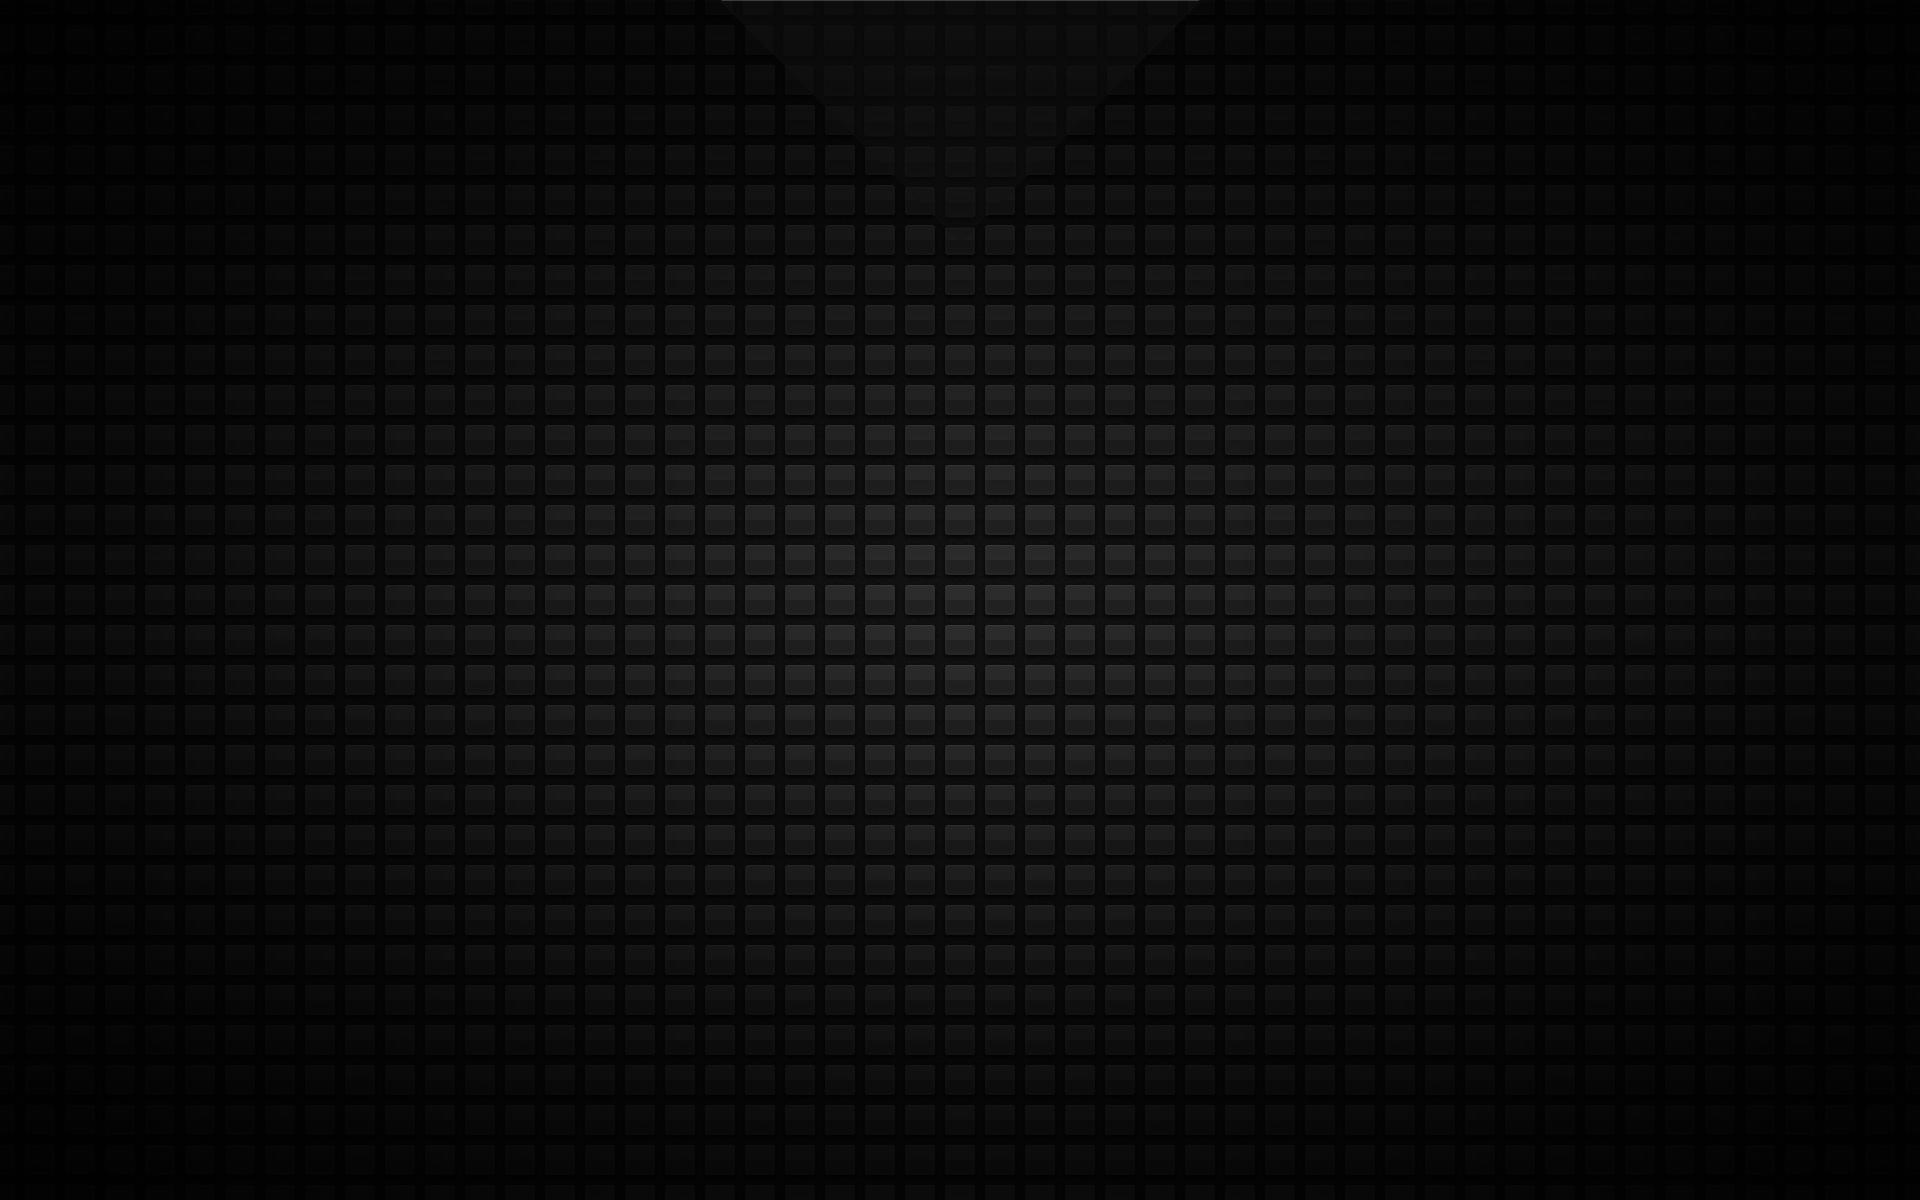 Black-Abstract-Widescreen-wallpaper-wpc5802854